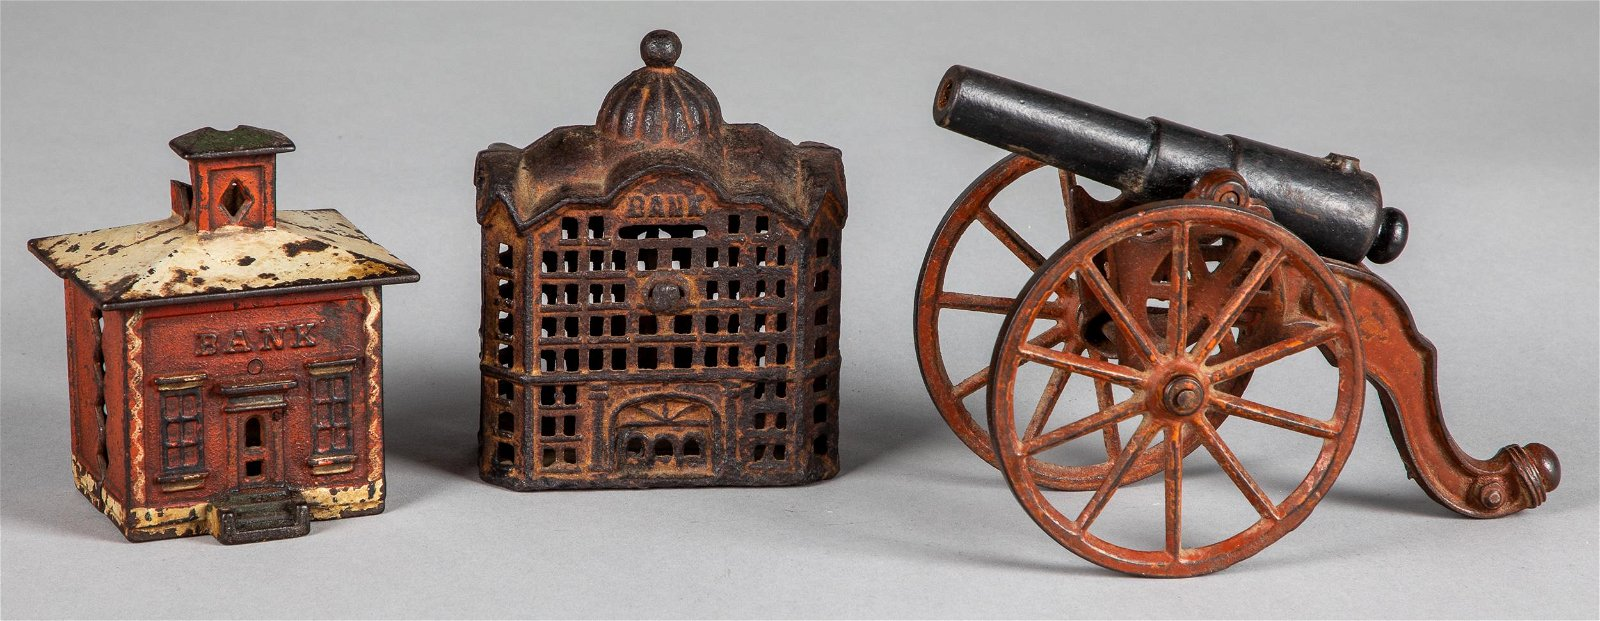 Three cast iron toys